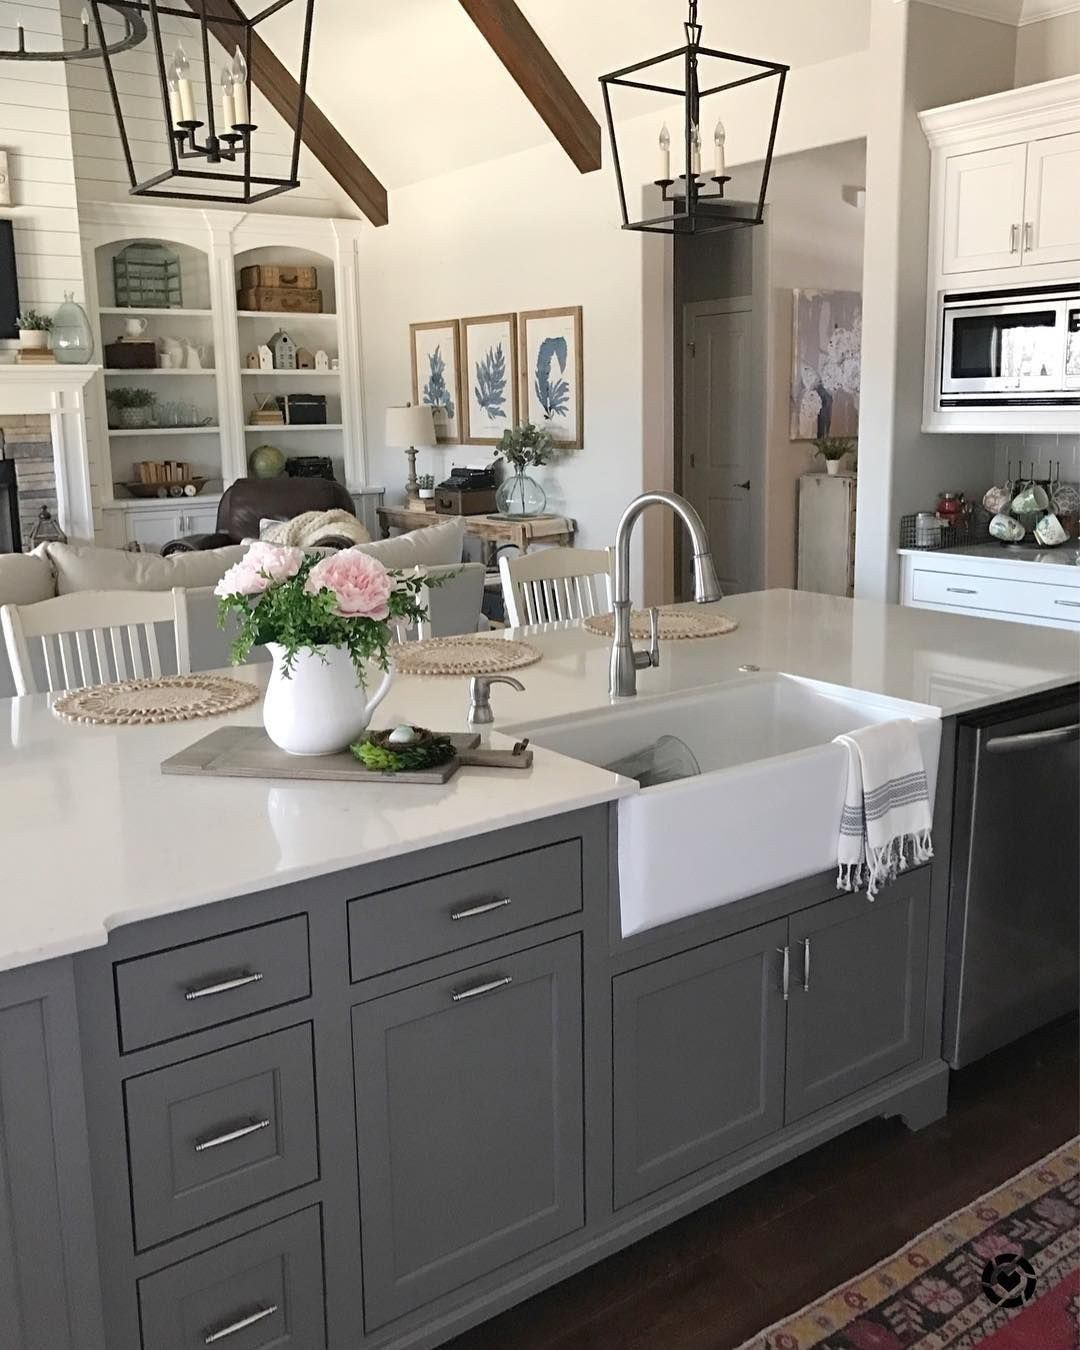 52 Farmhouse Sink Pros Cons Farmhouse Room Home Decor Kitchen Farmhouse Sink Kitchen Farmhouse Sink